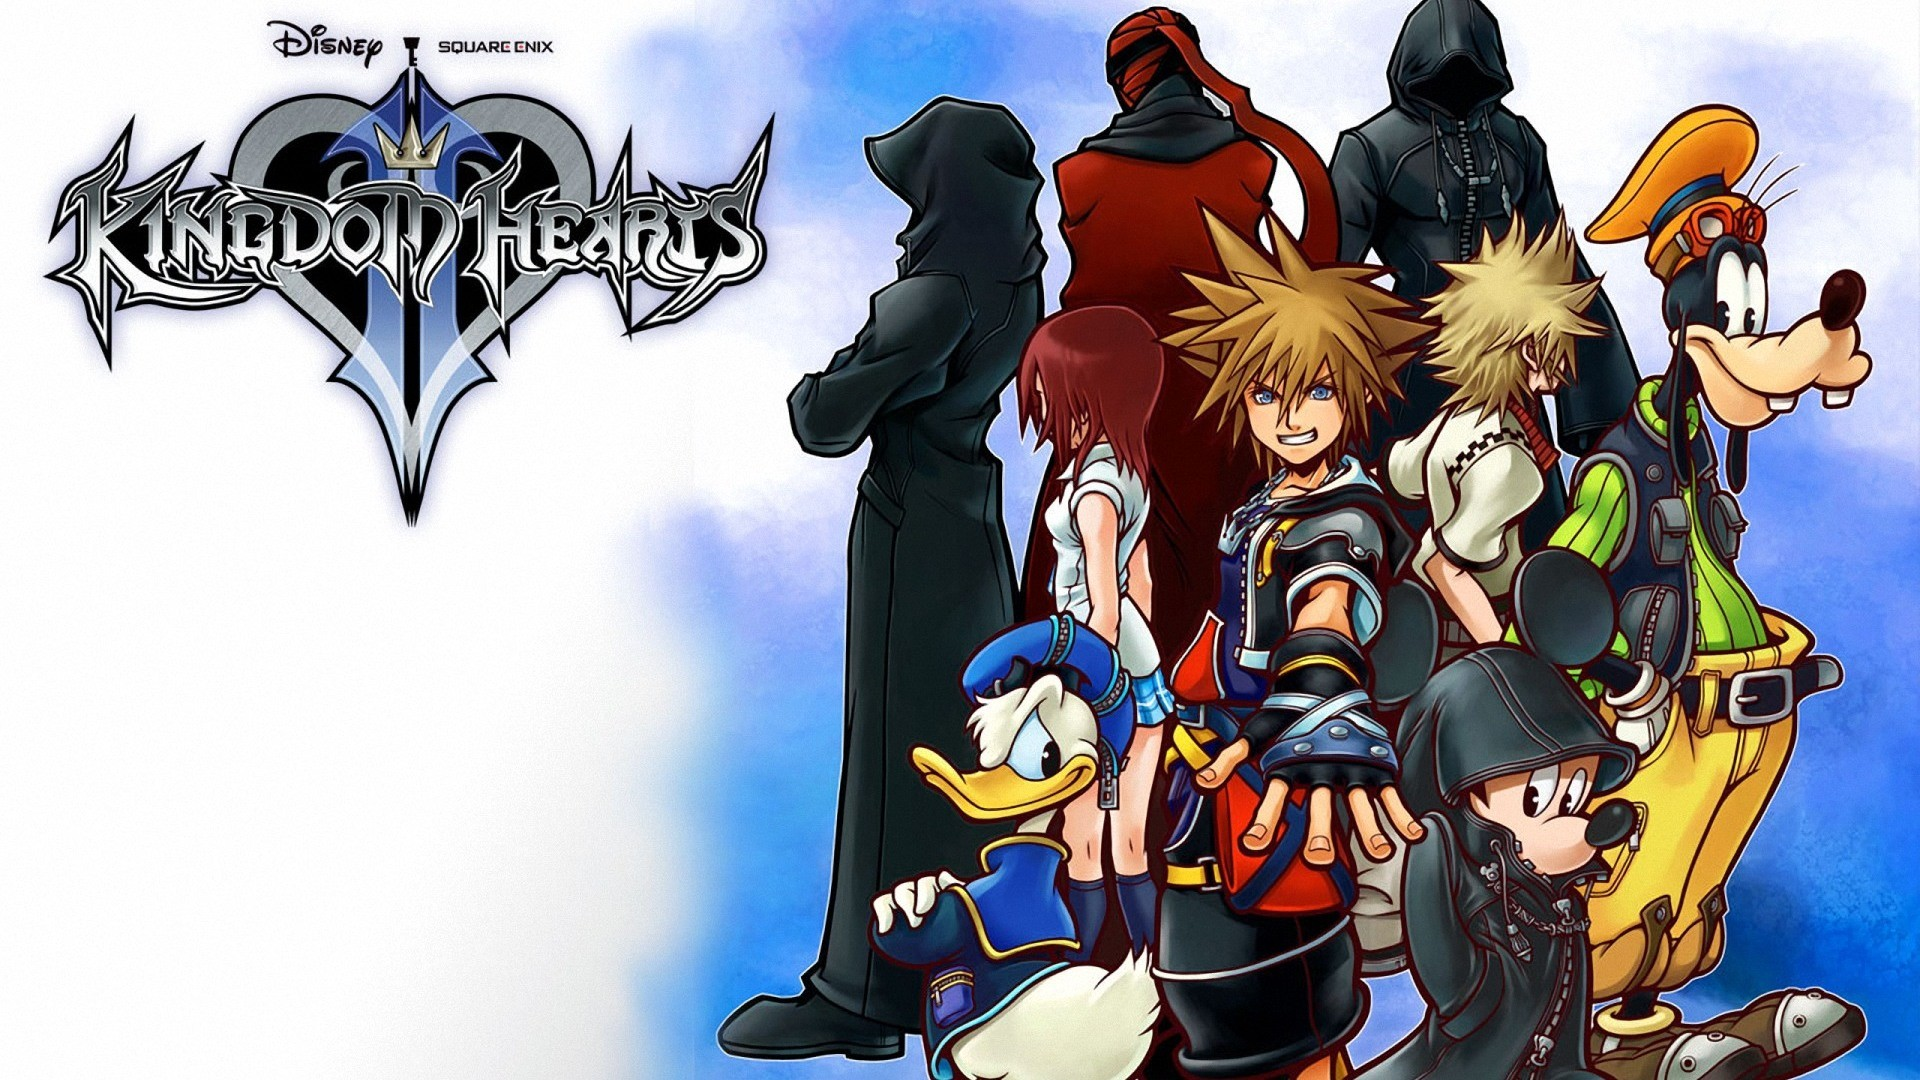 Kingdom Hearts III Wallpaper by The-Dark-Mamba-995 on